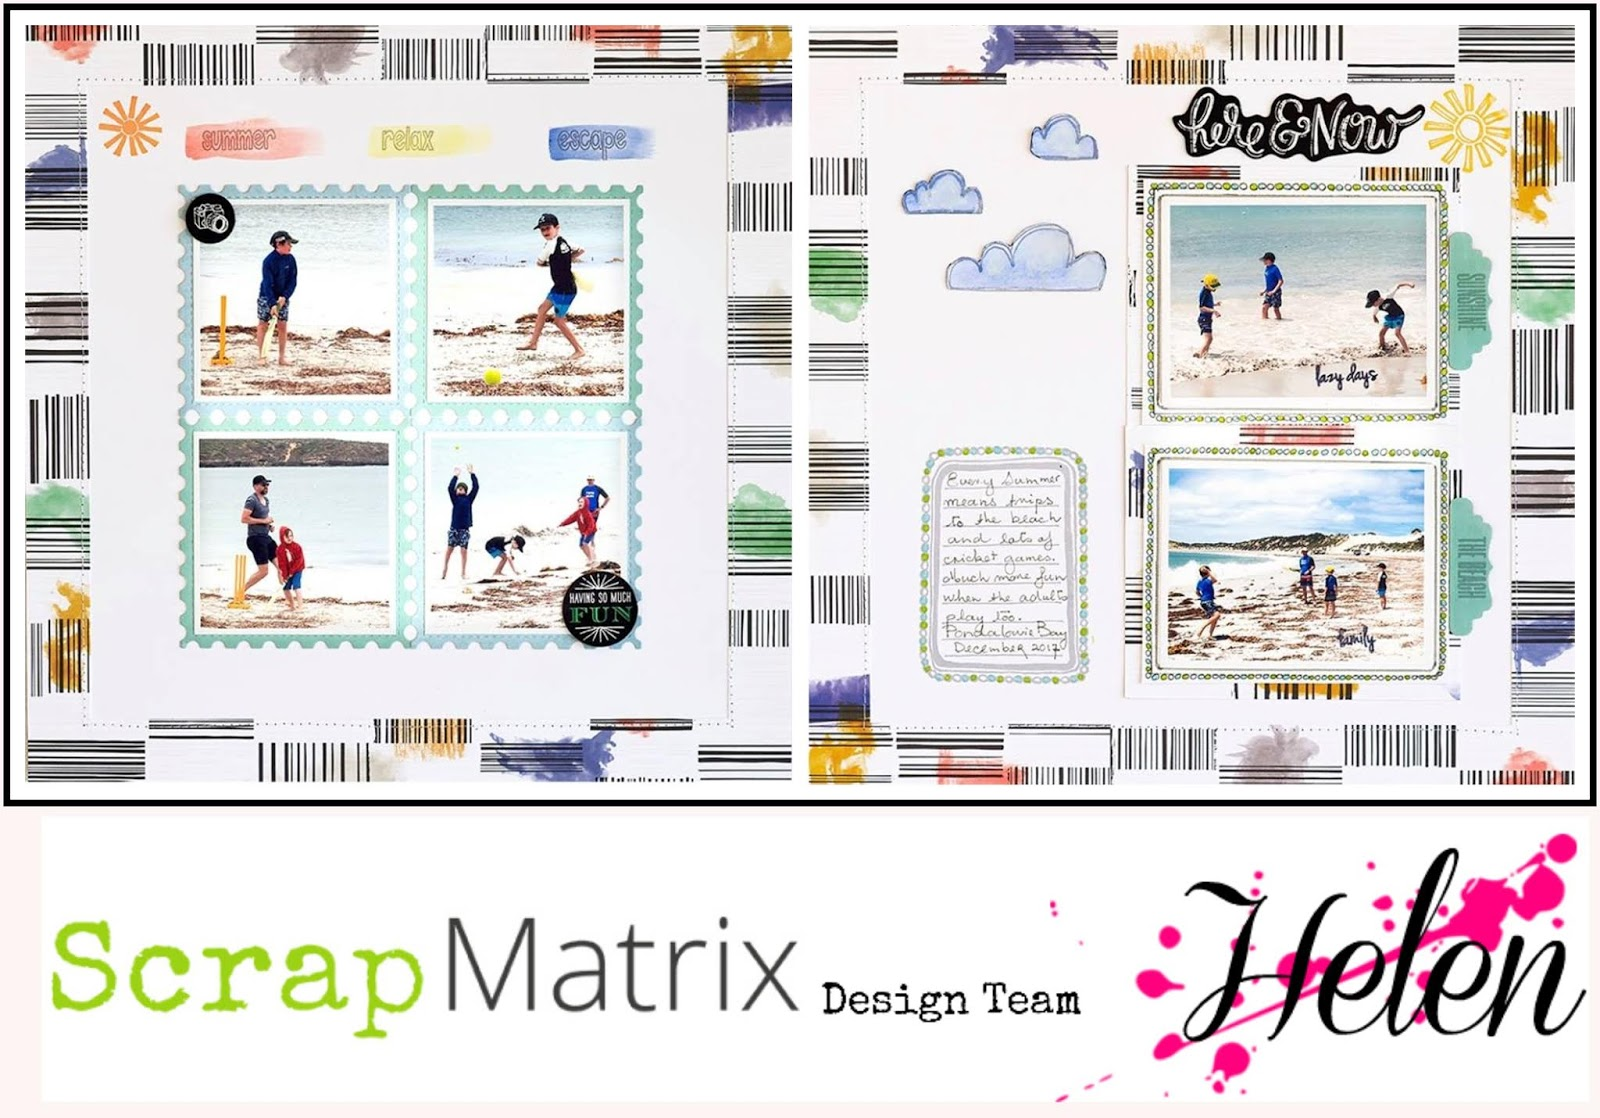 Scrap Matrix Blog: Scrap Matrix DT September 2018 - You\'ve been framed